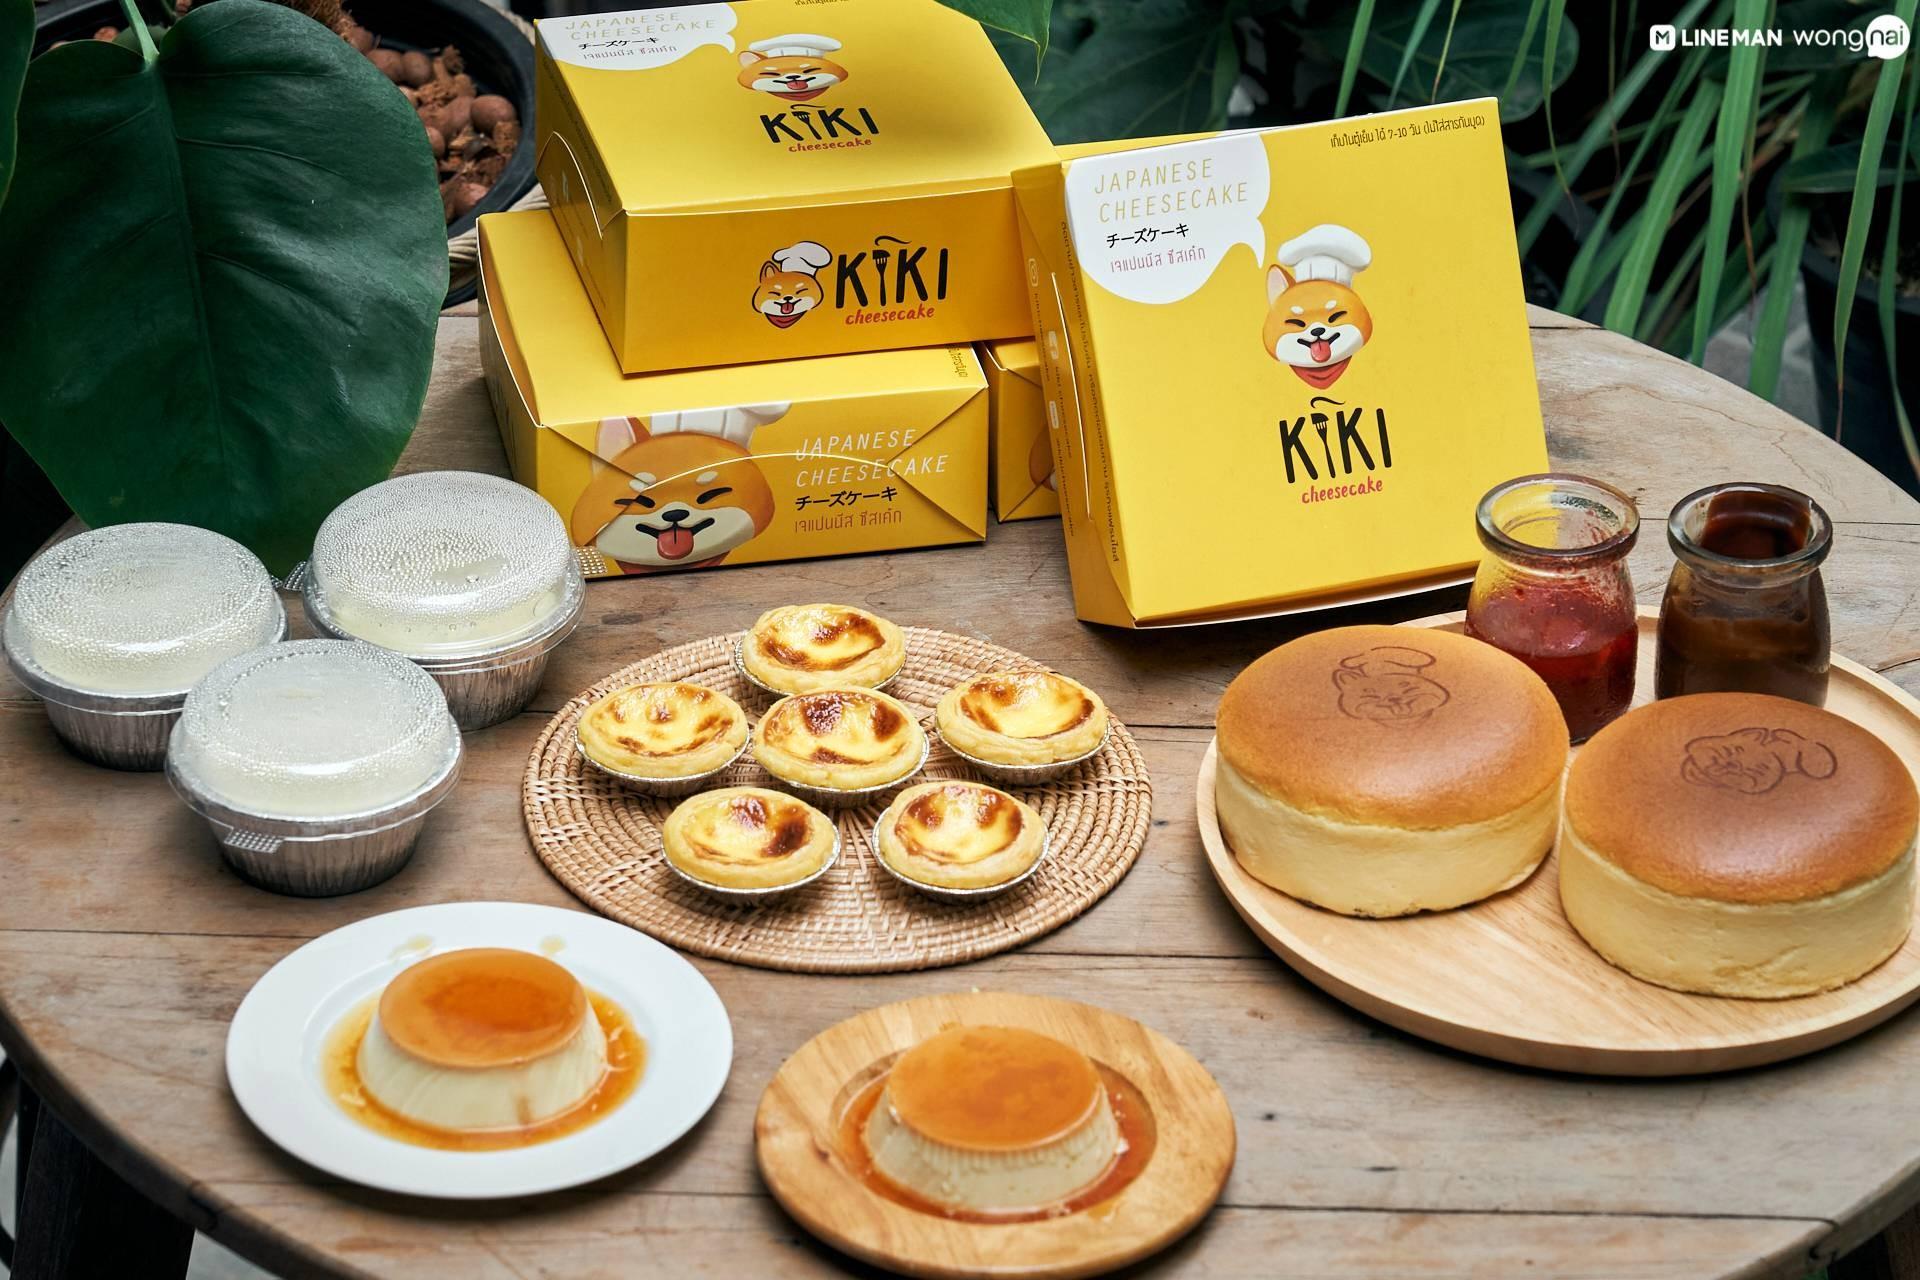 kiki cheesecake บางแสน